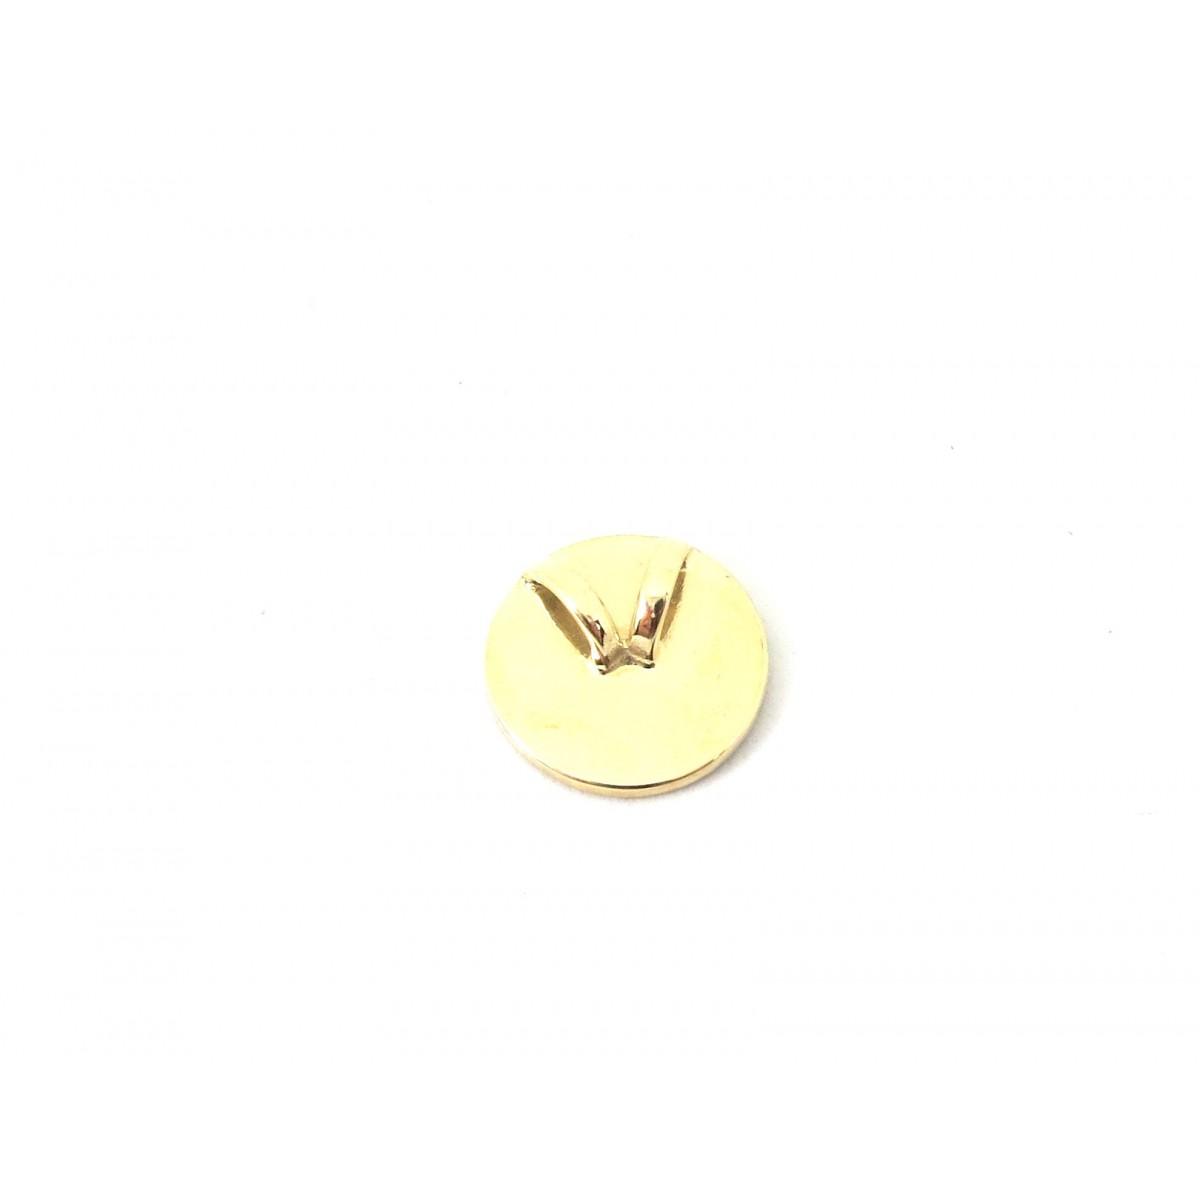 Pingente Redondo De Ouro 18k e Diamantes negros  - Sancy